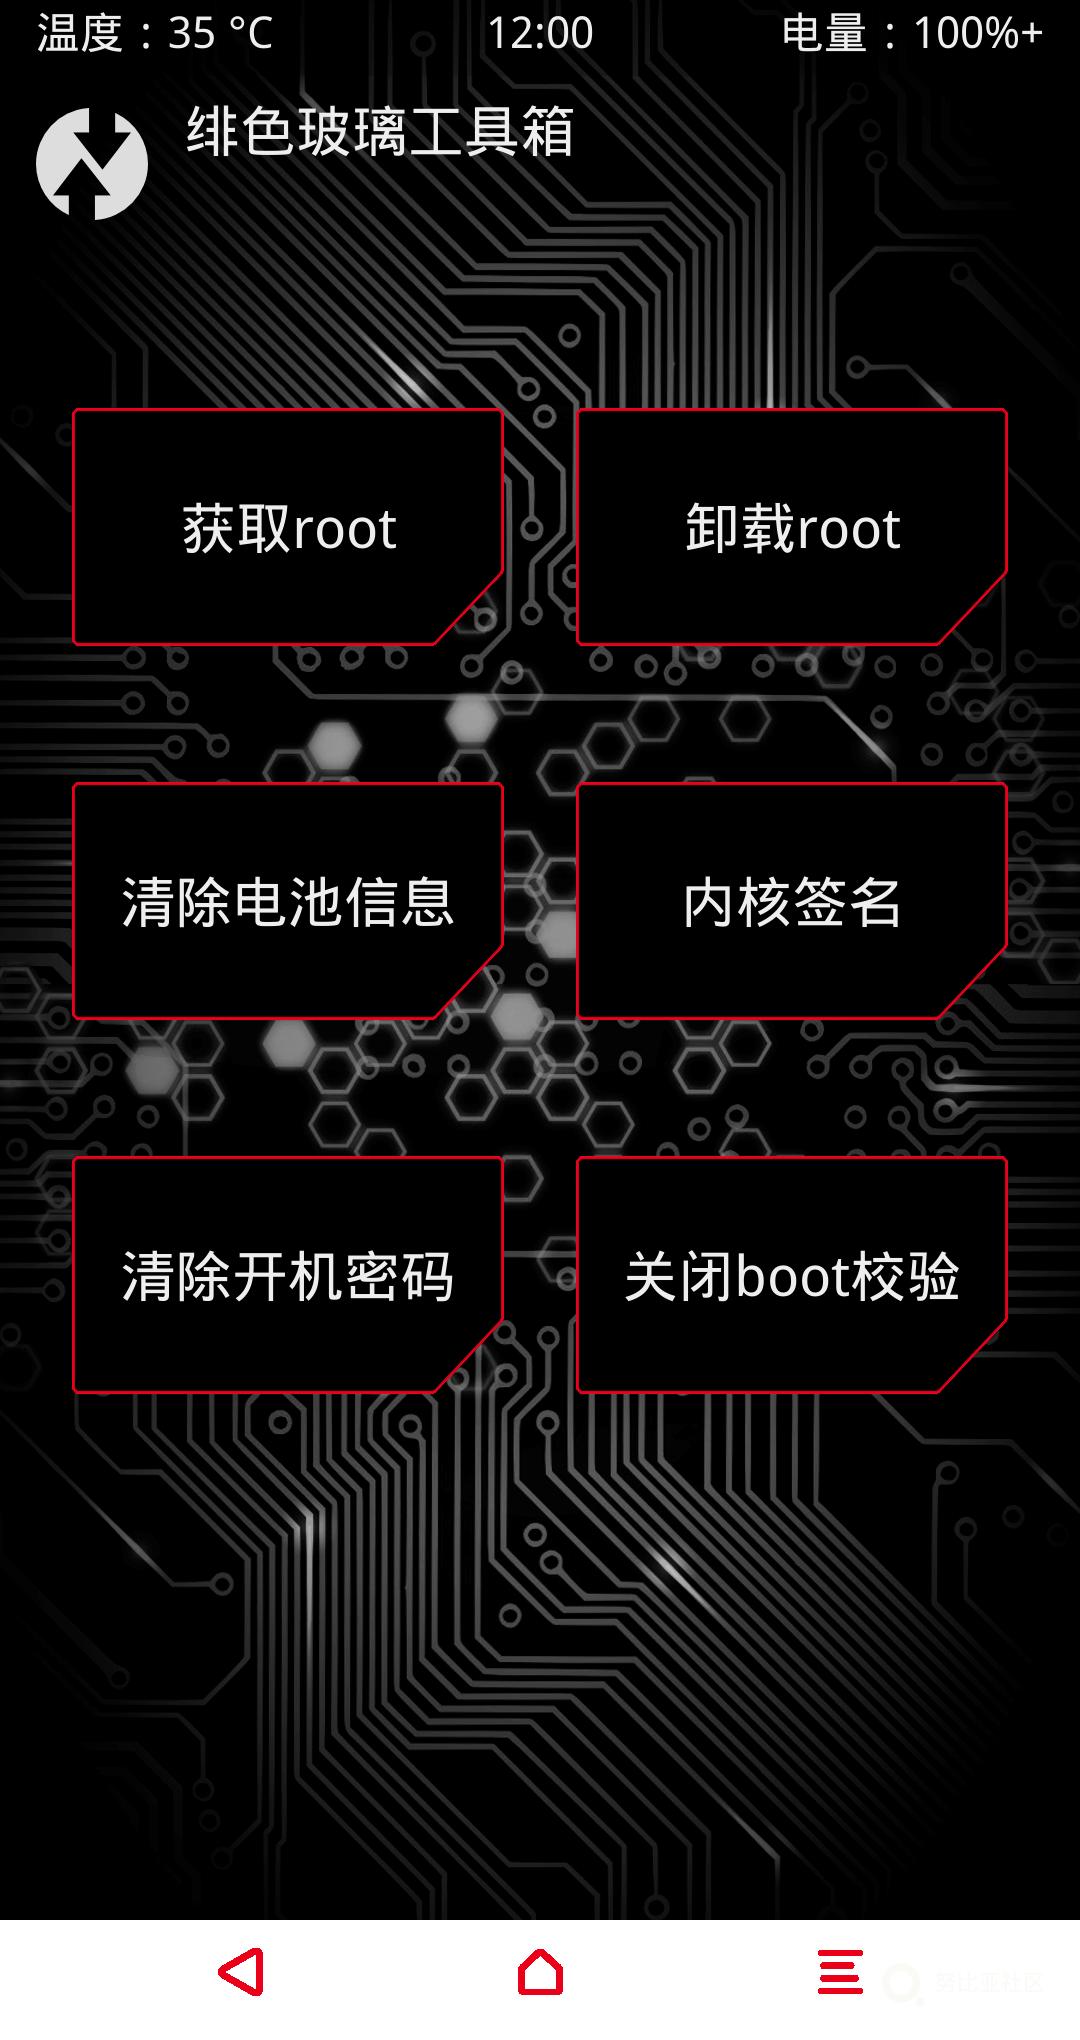 Screenshot_2012-11-04-12-00-53.png